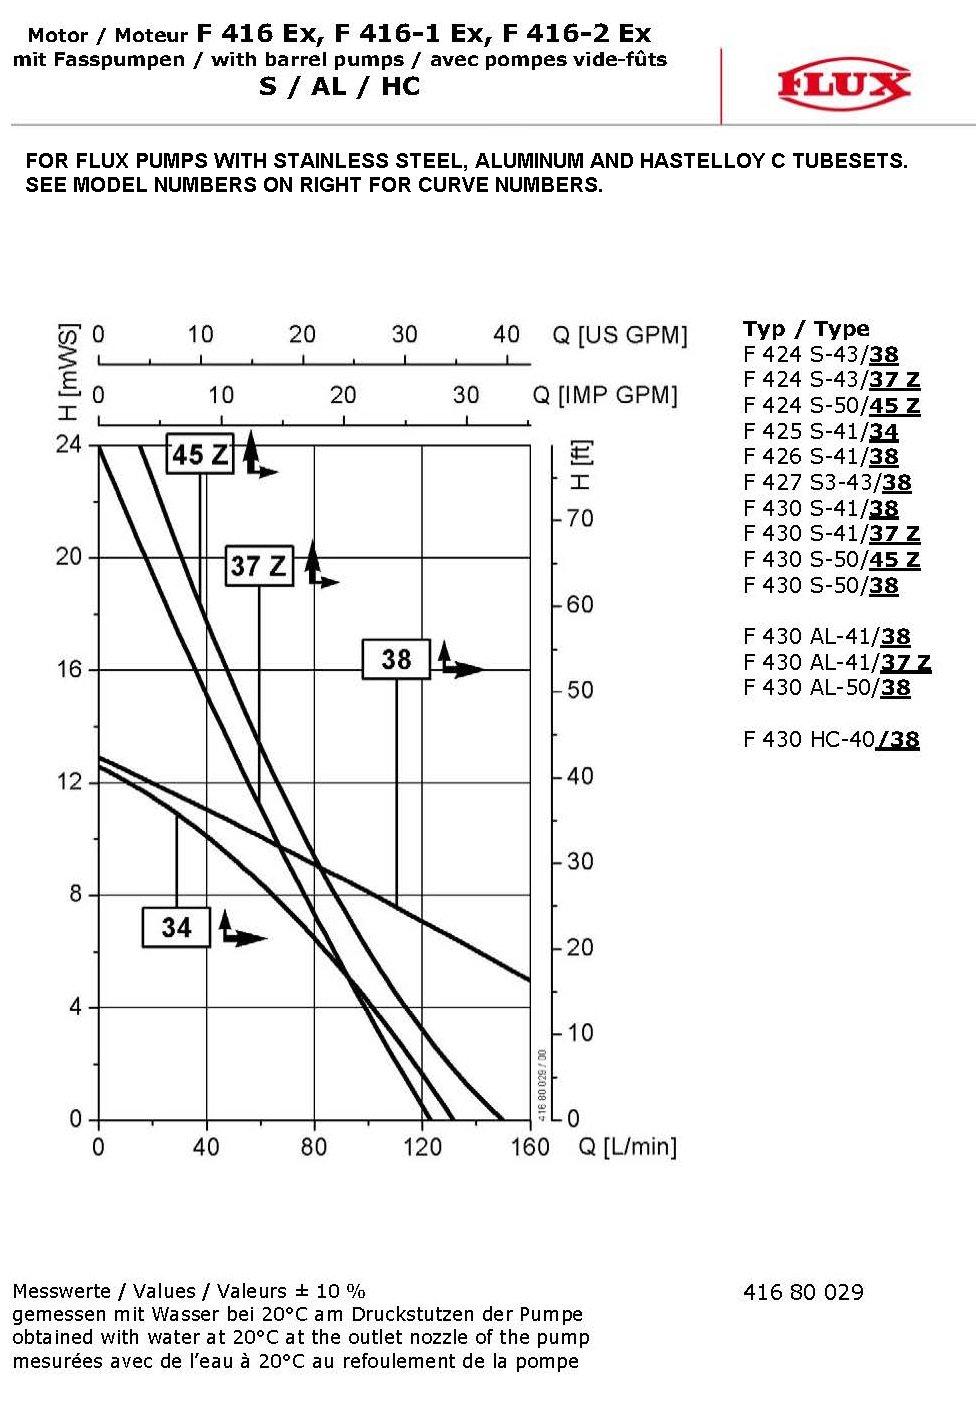 FLUX 416 00 125 Air Motors Type F 416-1 Ex, 470 W at 86 PSI / 17 CFM, Without Valve